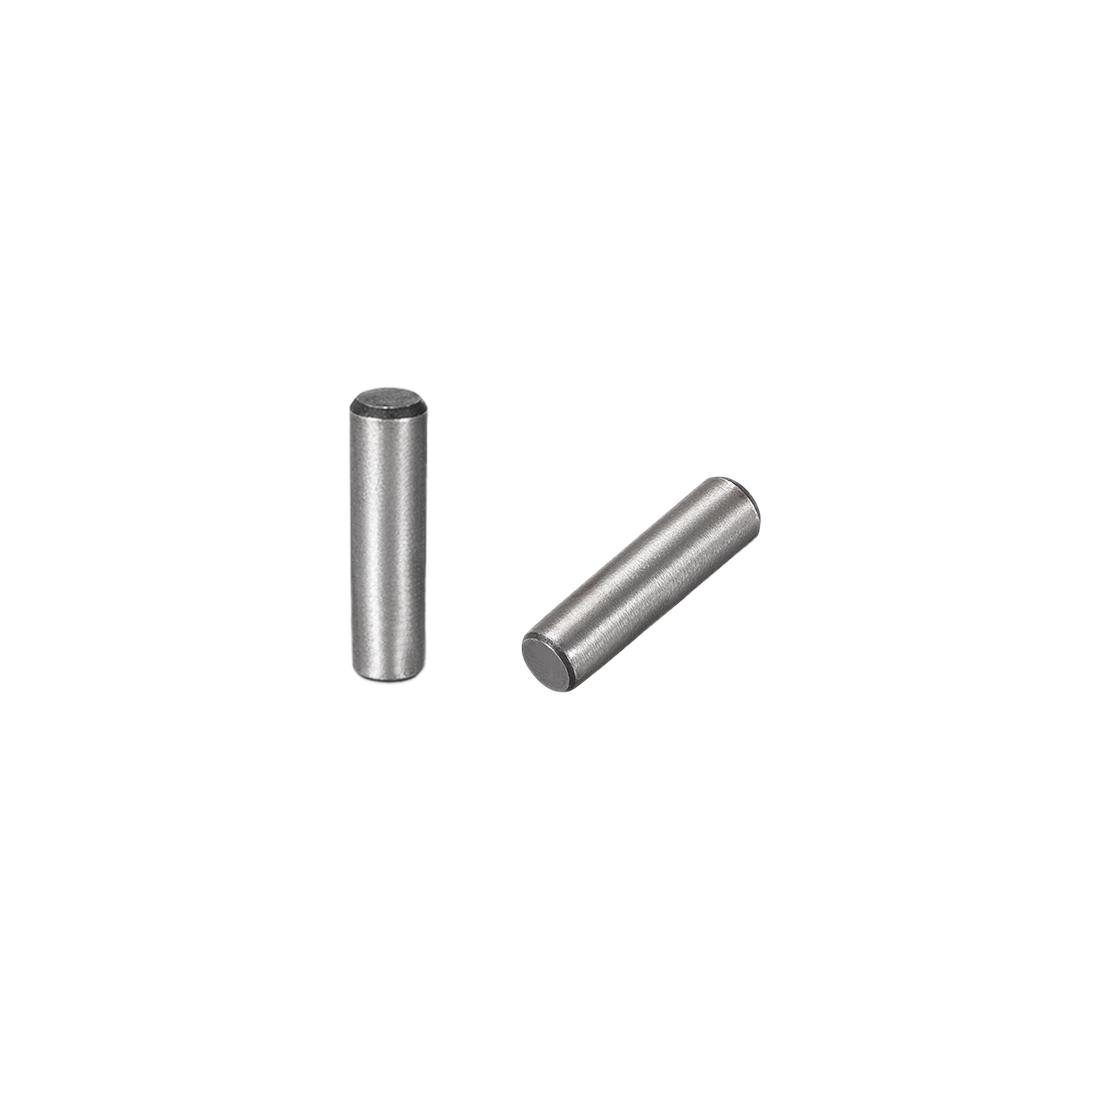 Carbon Steel GB117 20mm Length 5mmx5.4mm Small End Diameter 1:50 Taper Pin 20Pcs